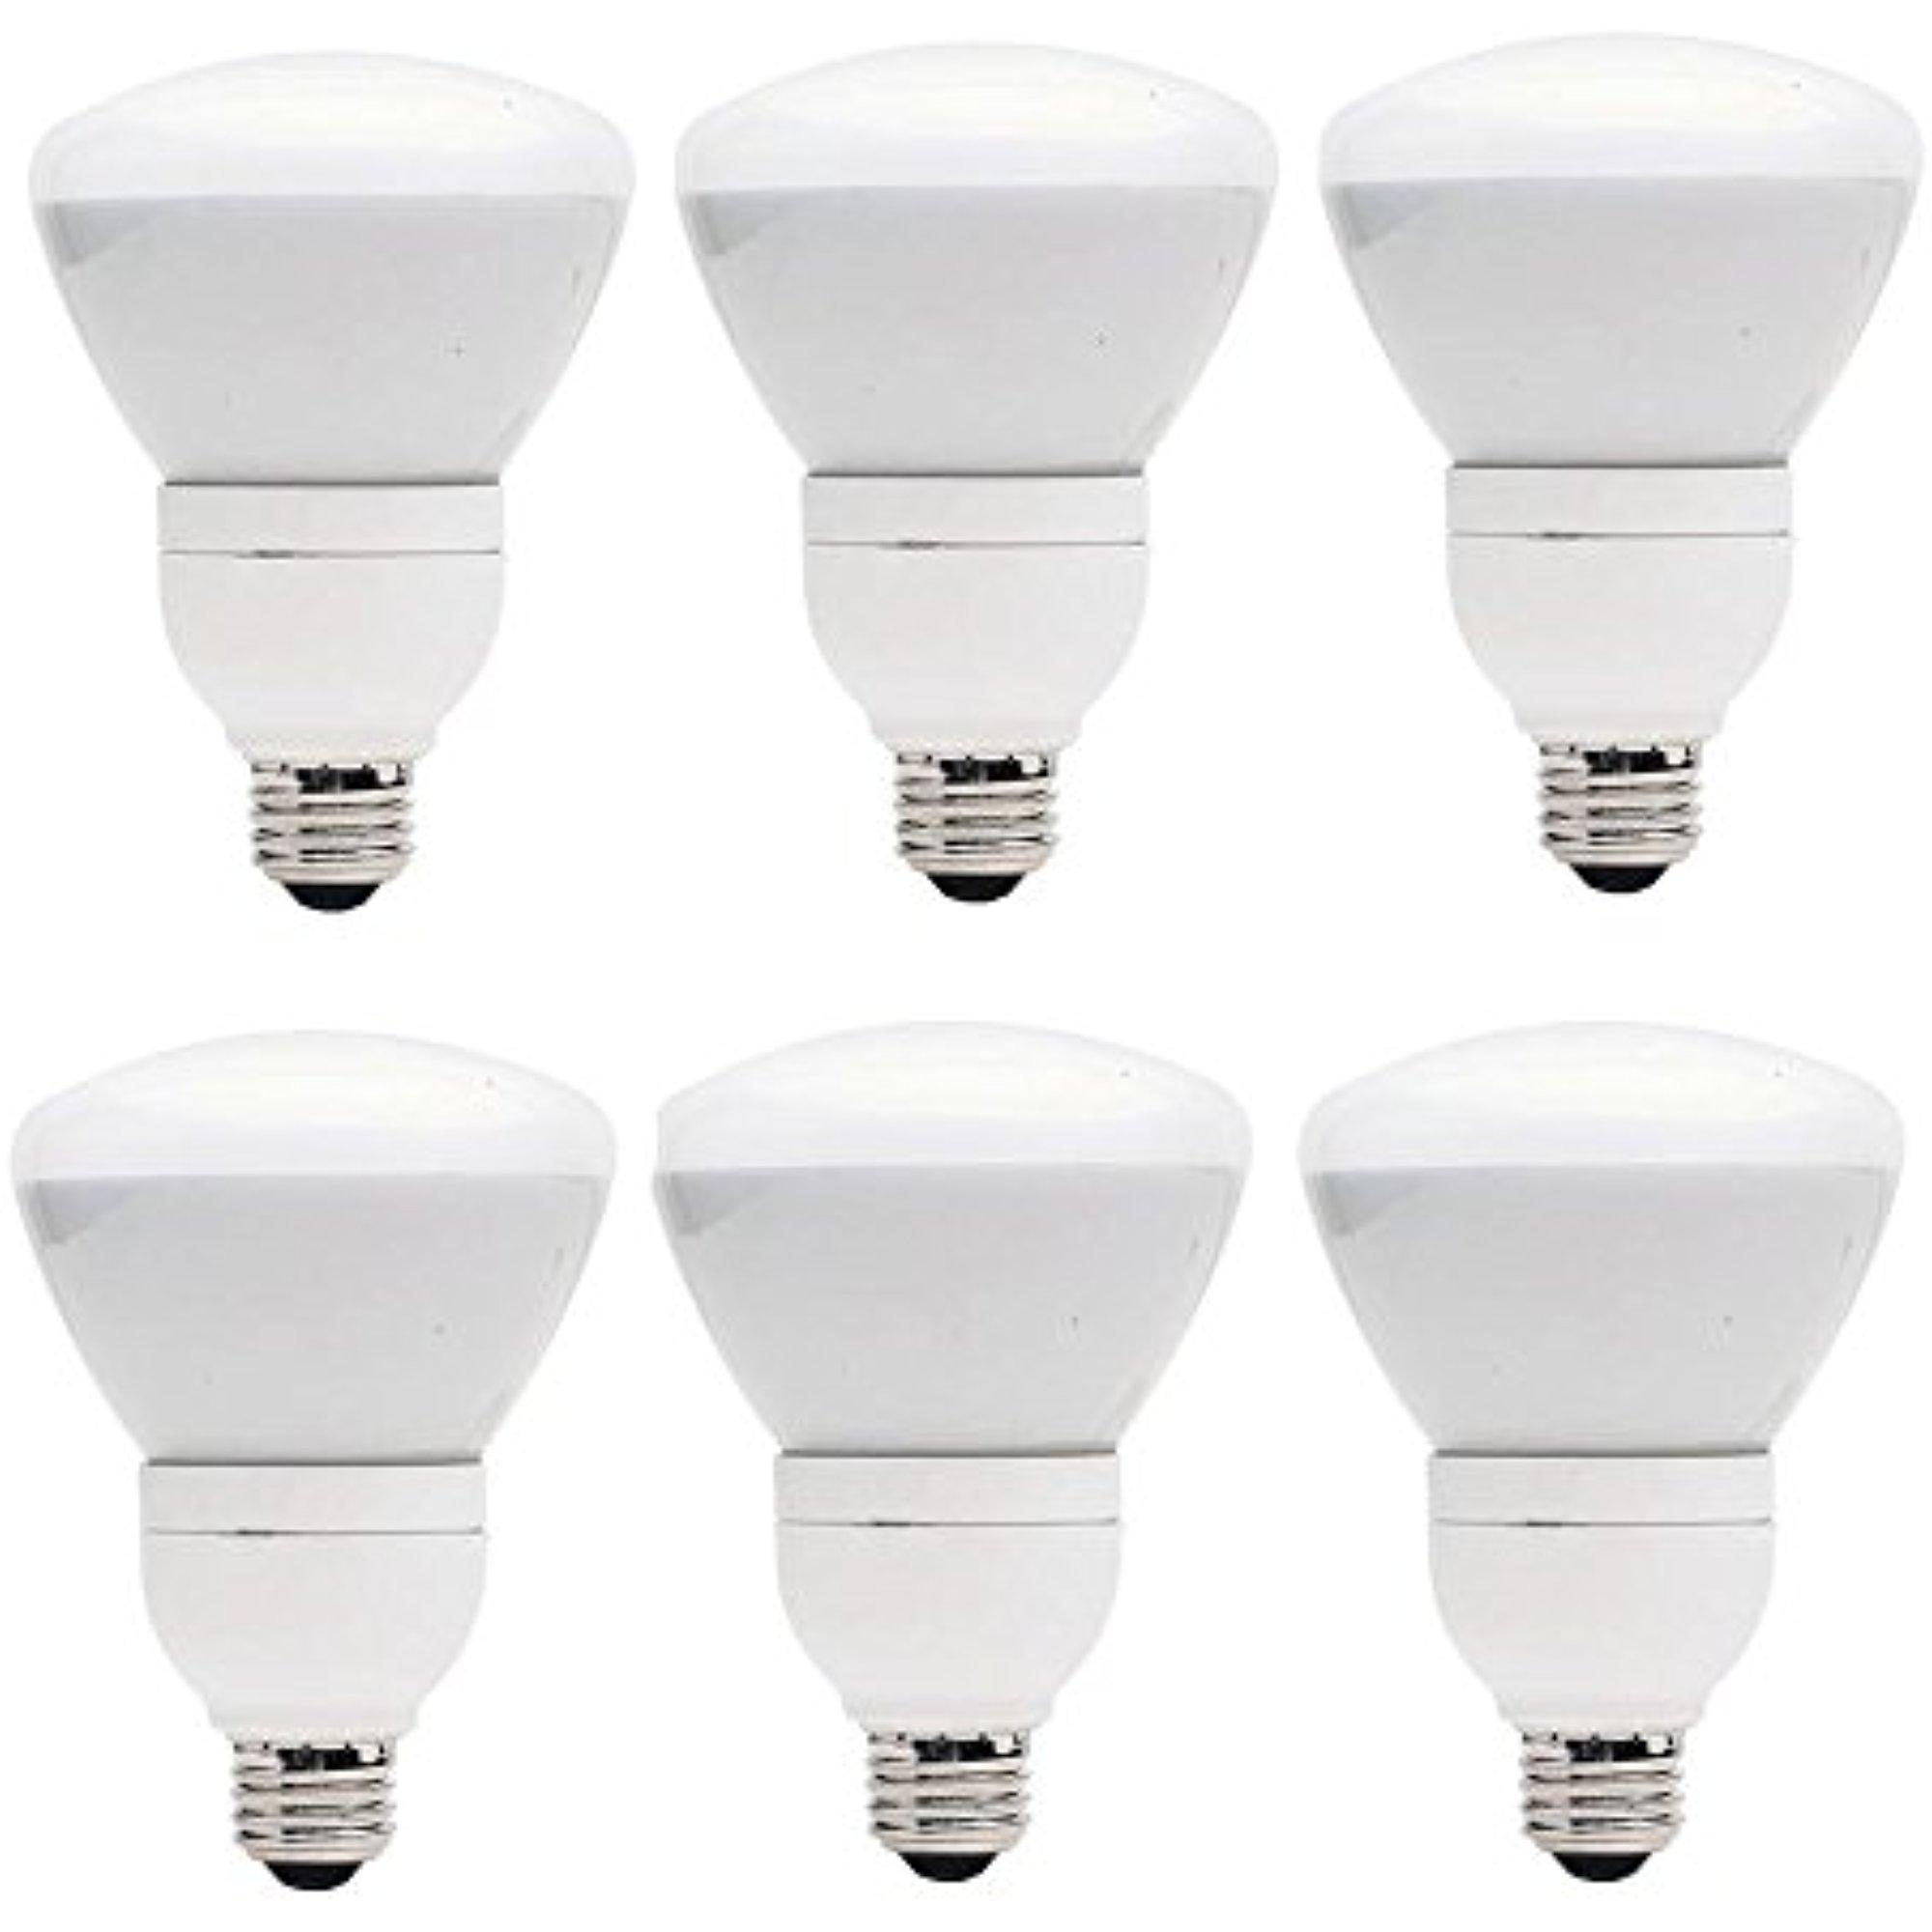 Set of 6 GE Lighting CFL 15W (65W Equivalent) R30 Soft Wh...